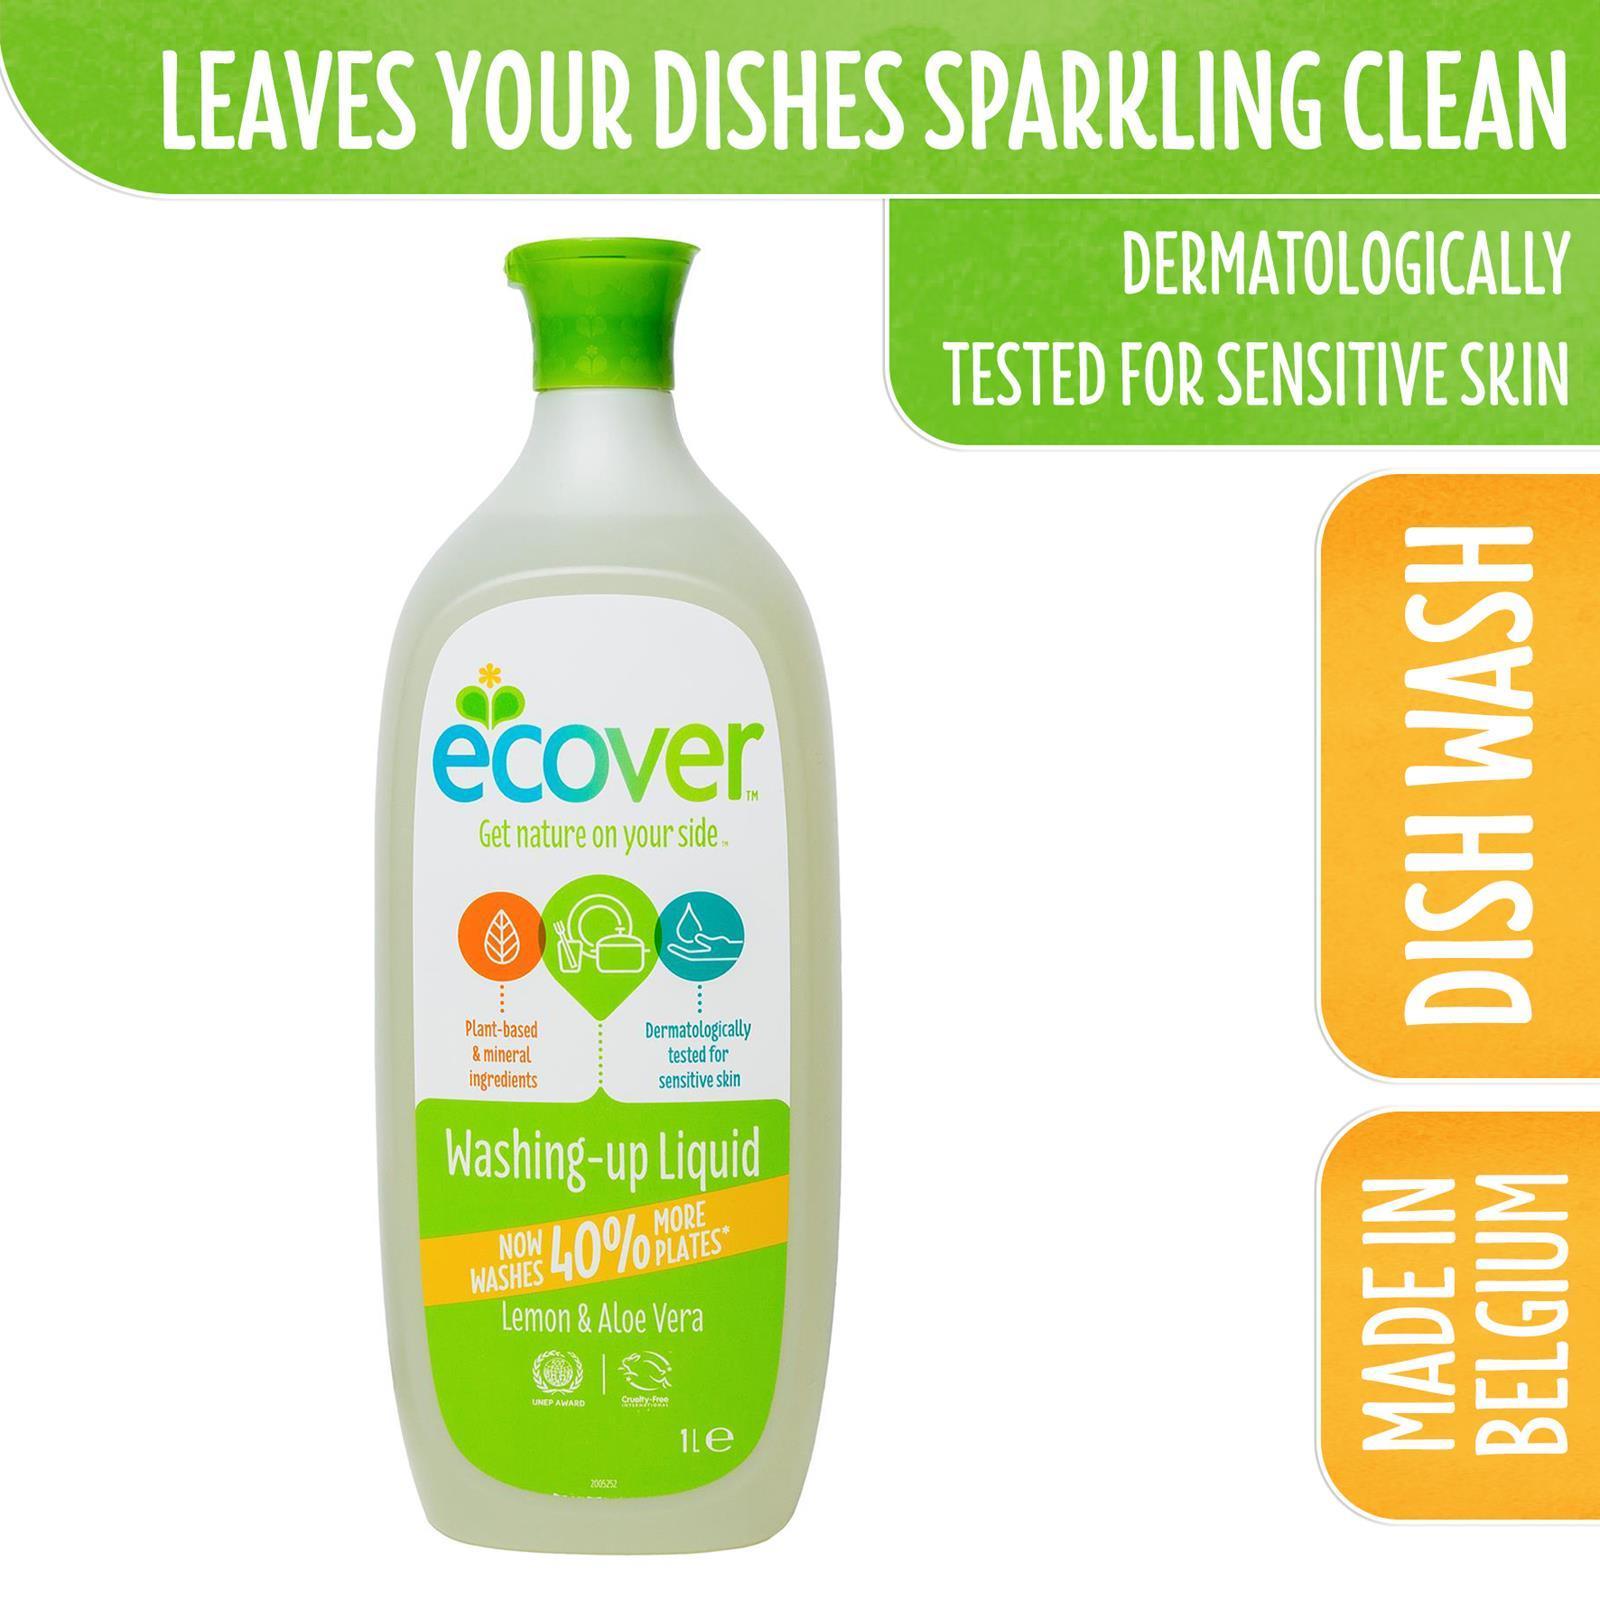 Ecover Washing-up Liquid - LemonAloe Vera 1L